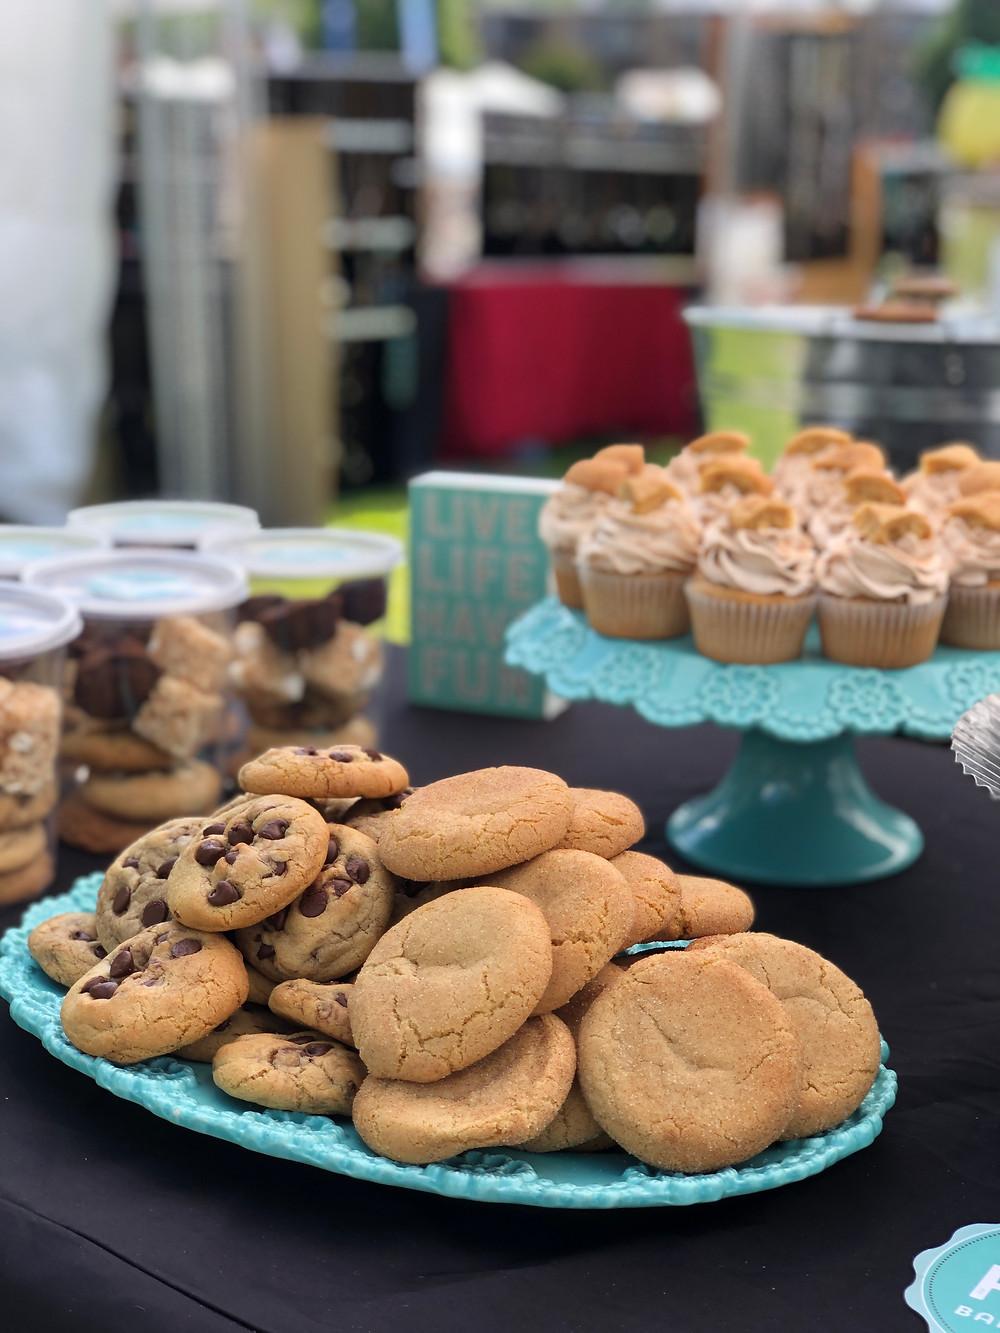 cookies, cupcakes, baked goods, bakery, kirkland uncorked, bellevue, hollywood baked goods, HBG